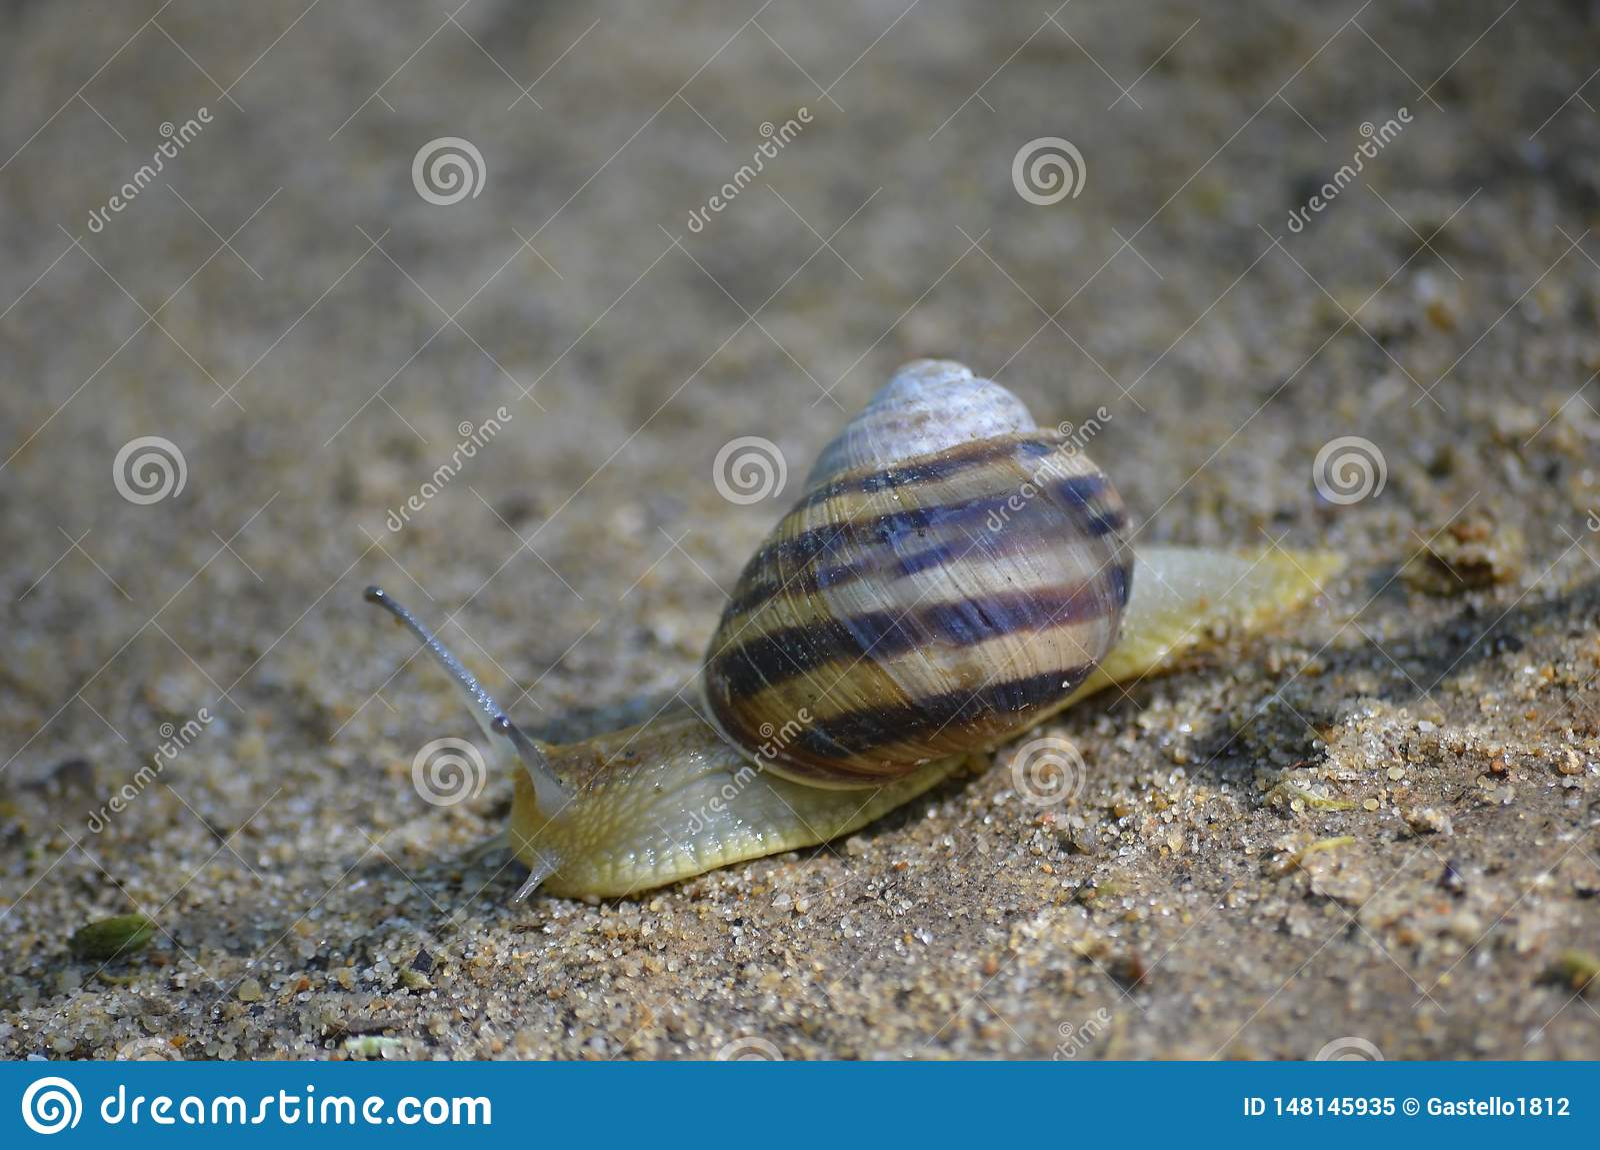 Grape snail crawling on the sand. Macro